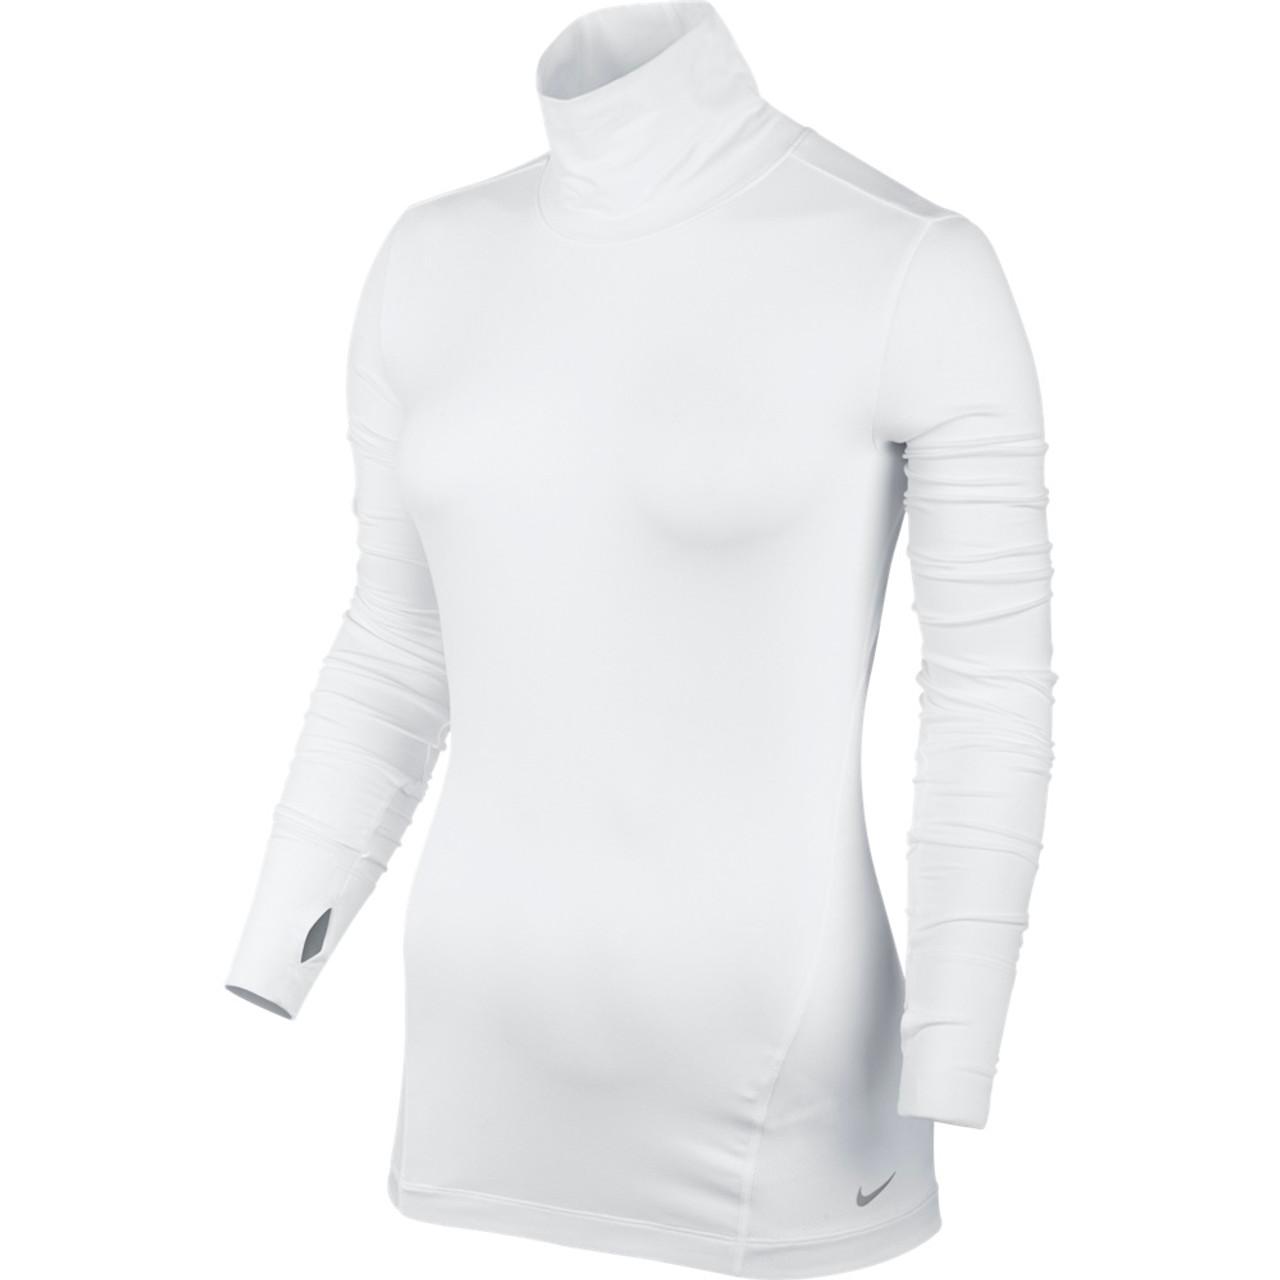 Nike golf women 39 s mock shirt black metallic silver x small for Silver metallic shirt women s